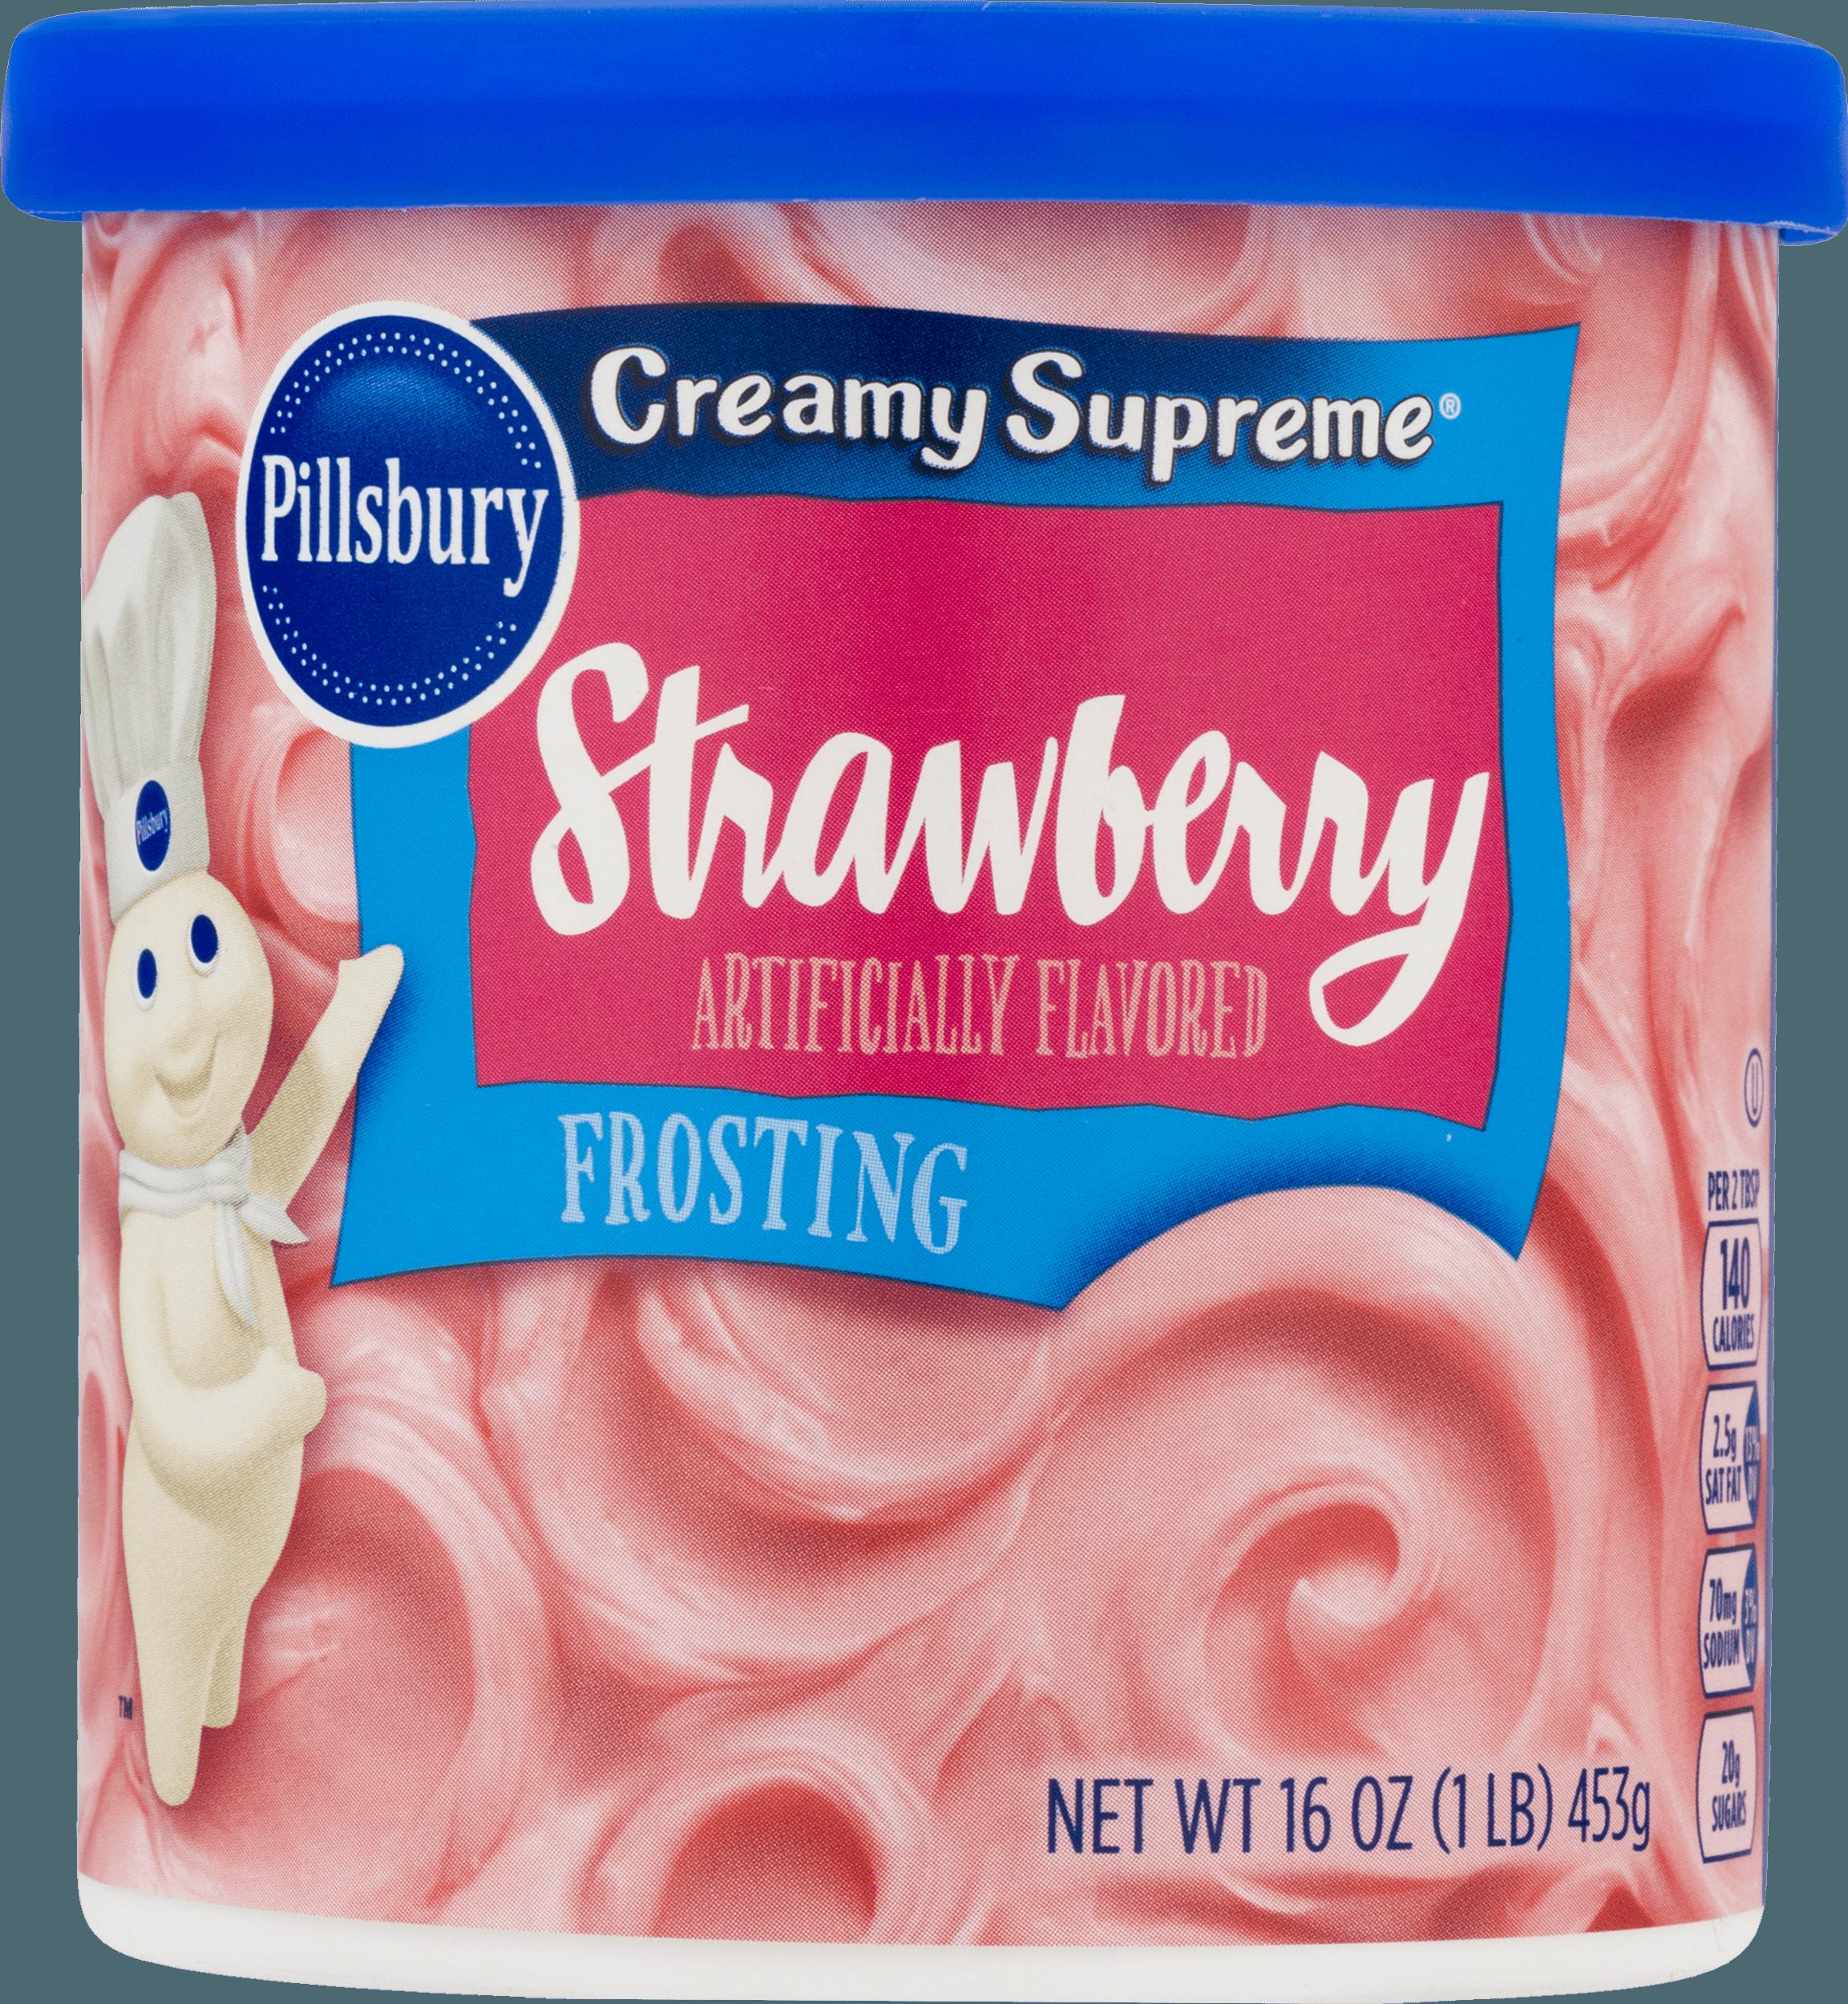 (4 Pack) Pillsbury Creamy Supreme Strawberry Flavored Frosting, 16 Oz